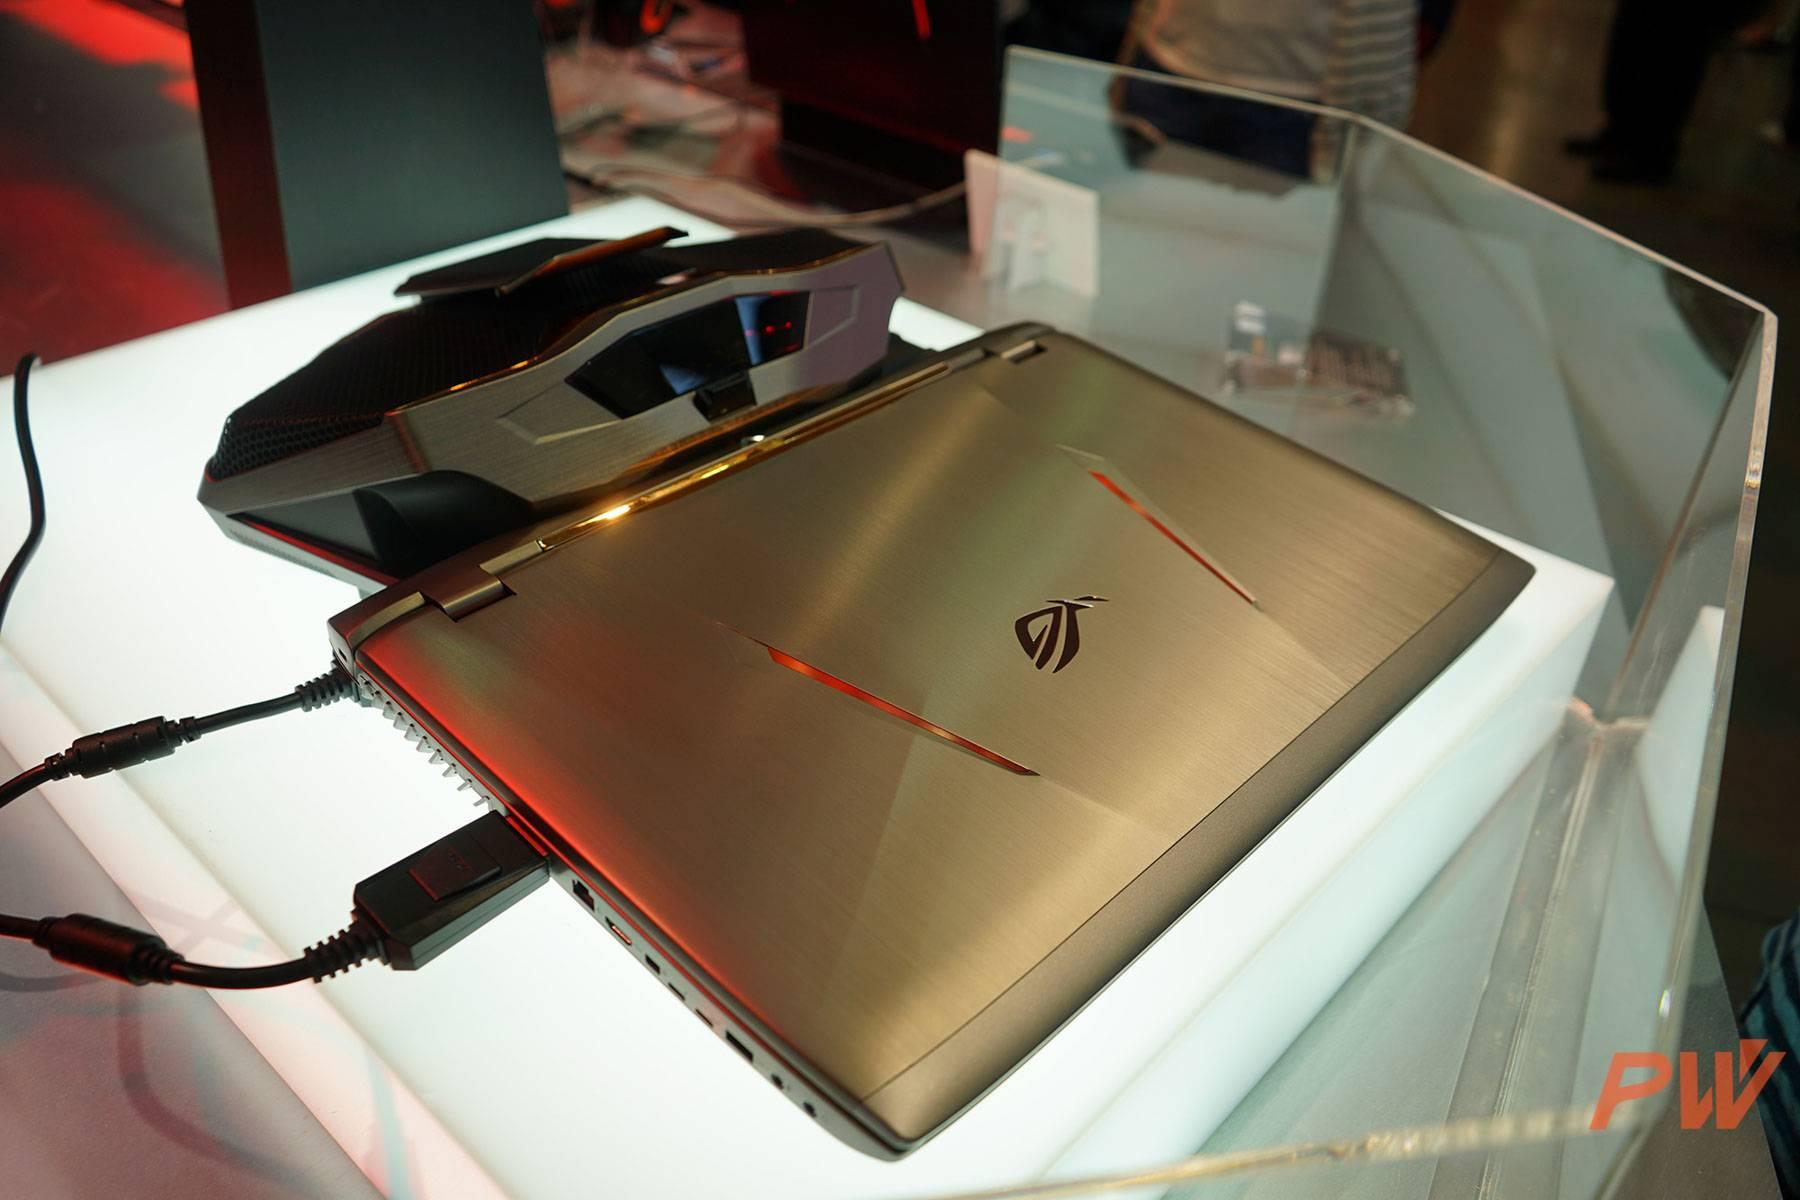 ASUS ROG GX800 COMPUTEX TAIPEI 2016 PingWest Photo By Hao Ying